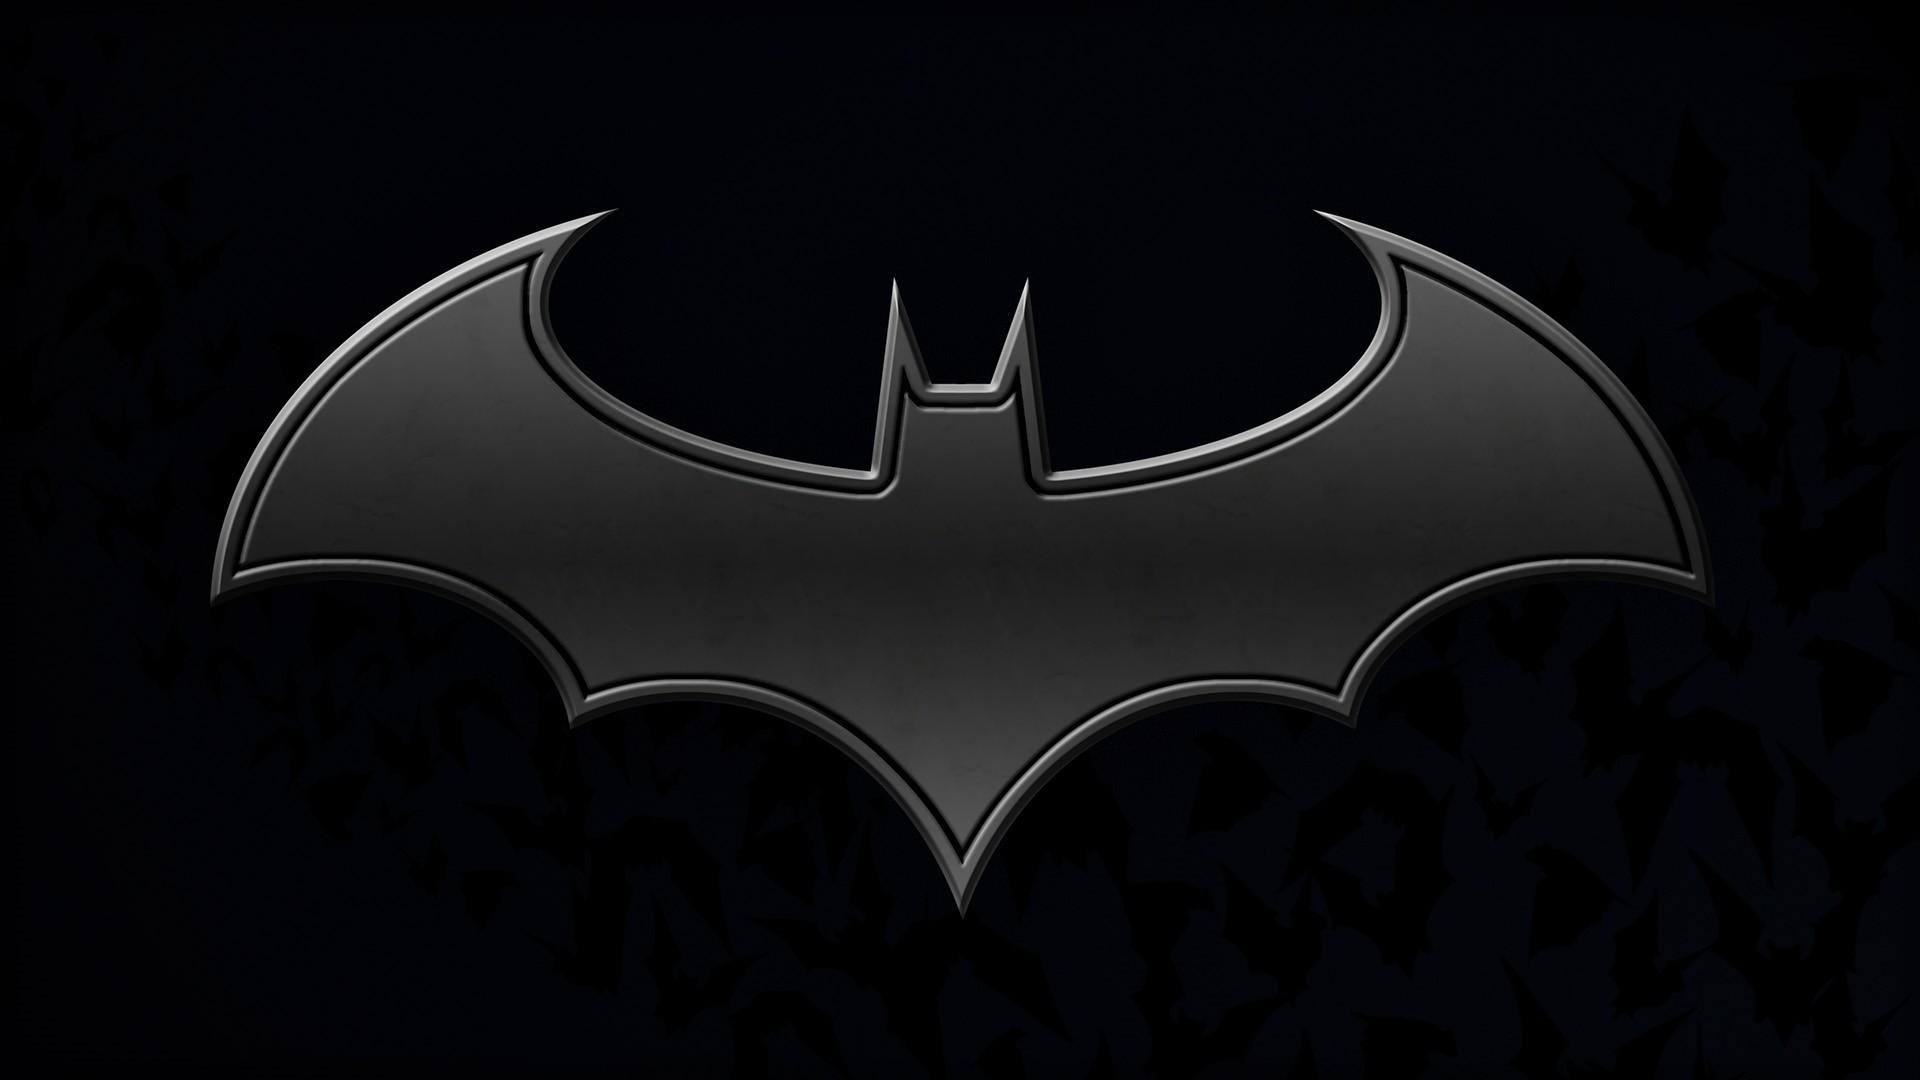 Batman HD Wallpapers for Desktop 1920×1080 Batman animated wallpapers (39  Wallpapers) |